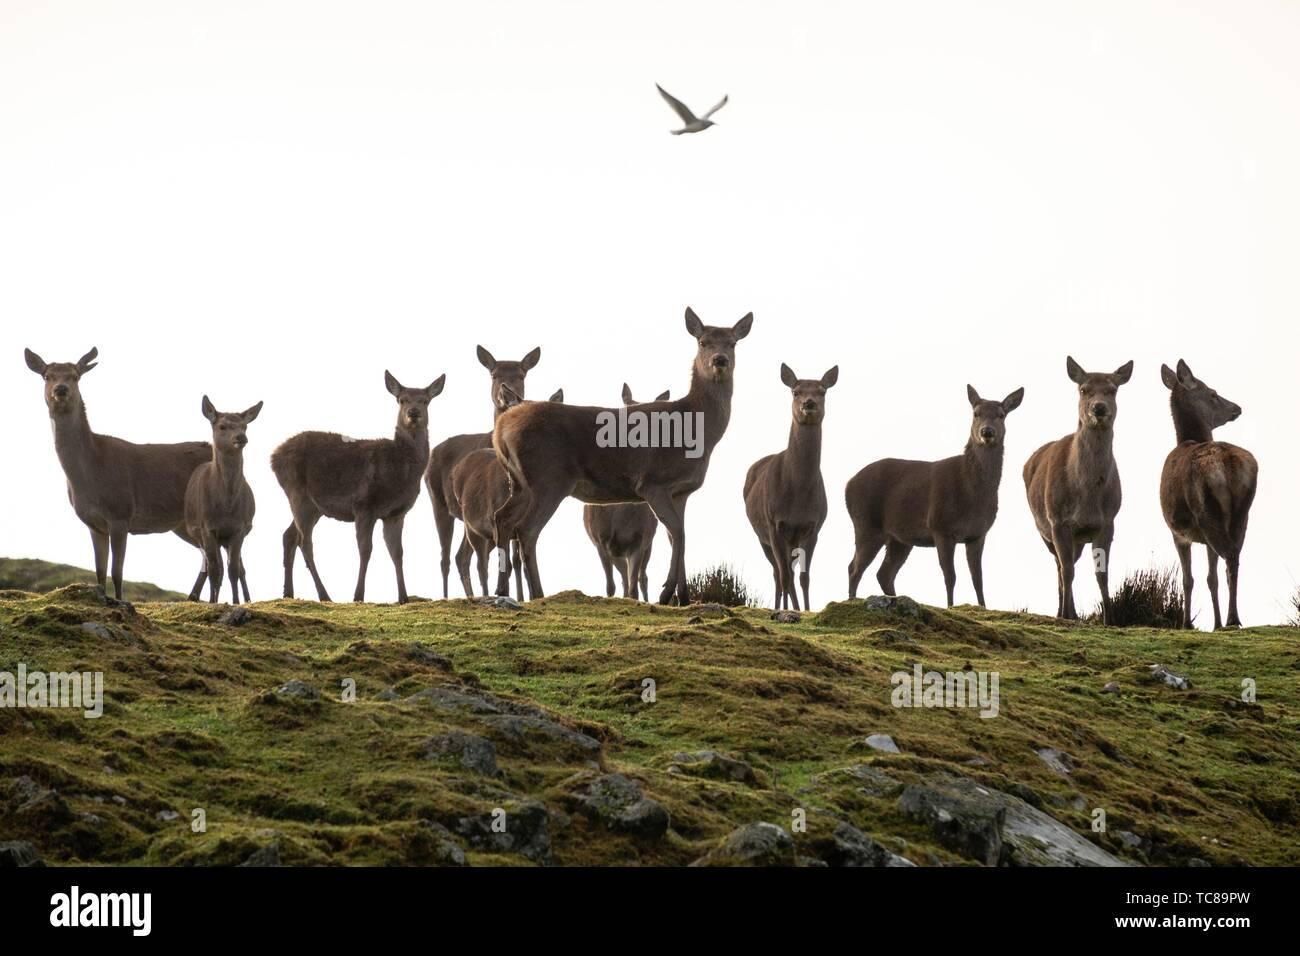 Ciervo rojo, Cervus elaphus scoticus, Parque Nacional de Cairngorms, Highlands, Escocia, Reino Unido. Foto de stock